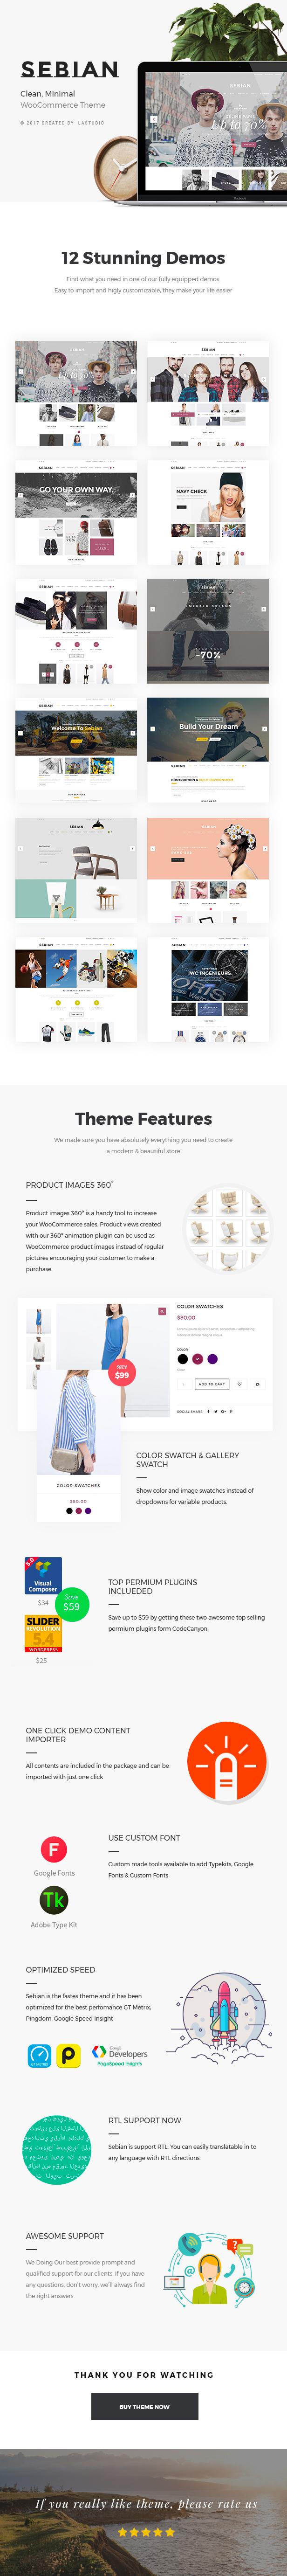 Sebian - Mehrzweck-WordPress-WooCommerce-Layout